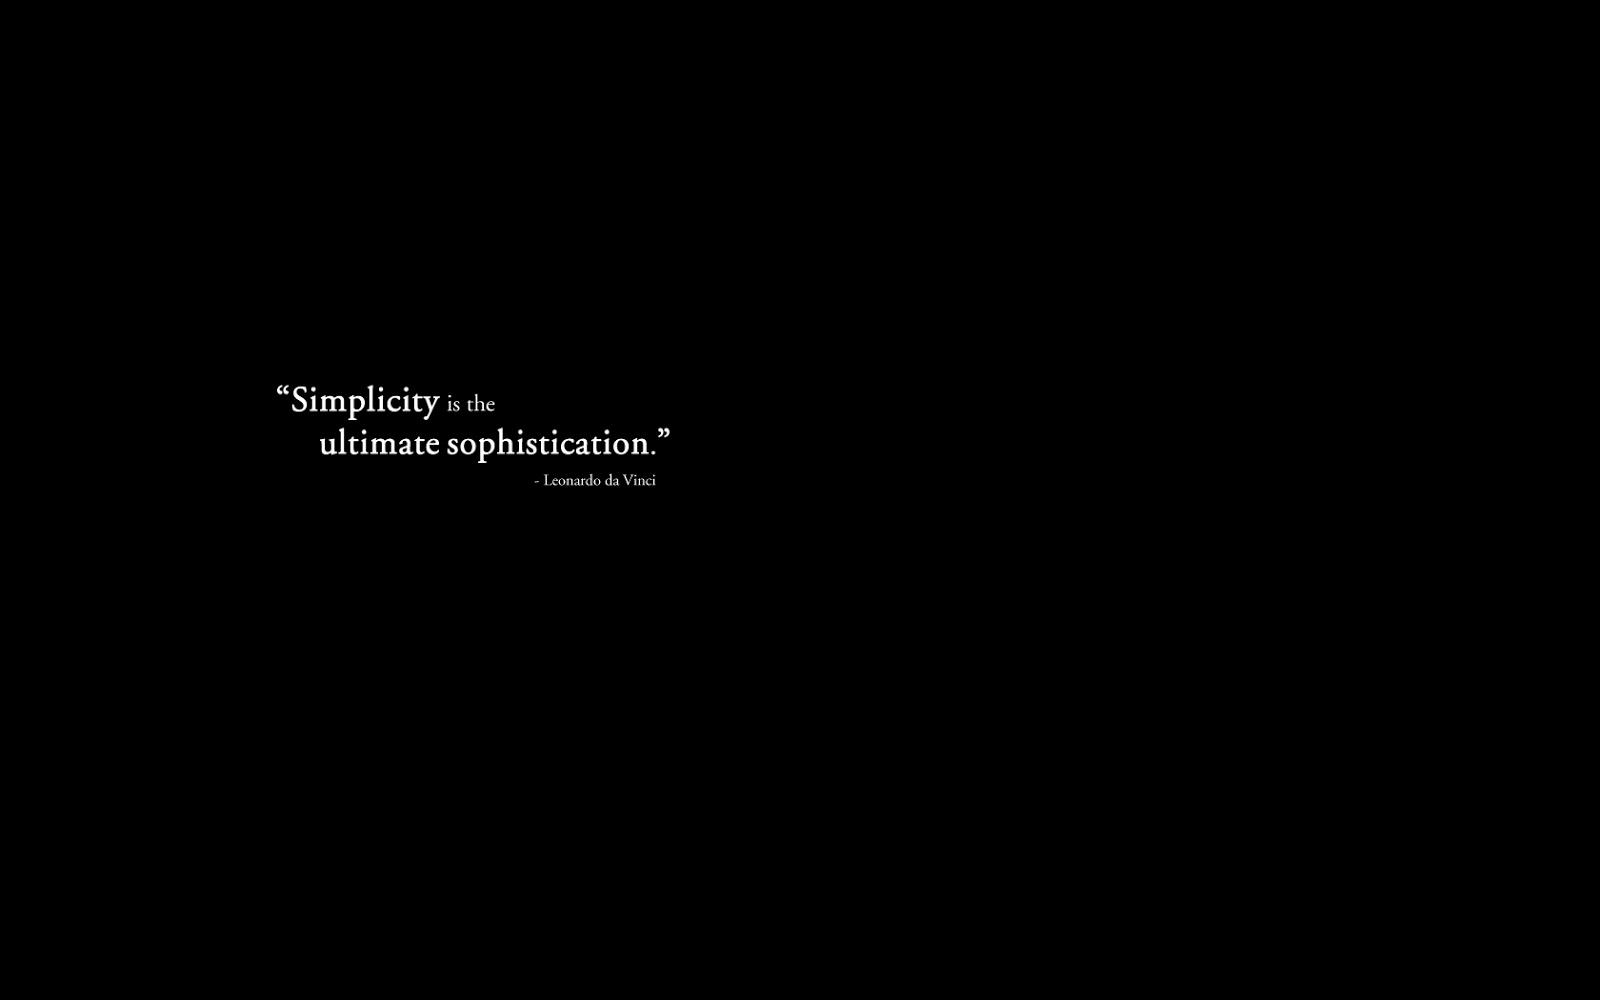 Black Wallpaper Quotes